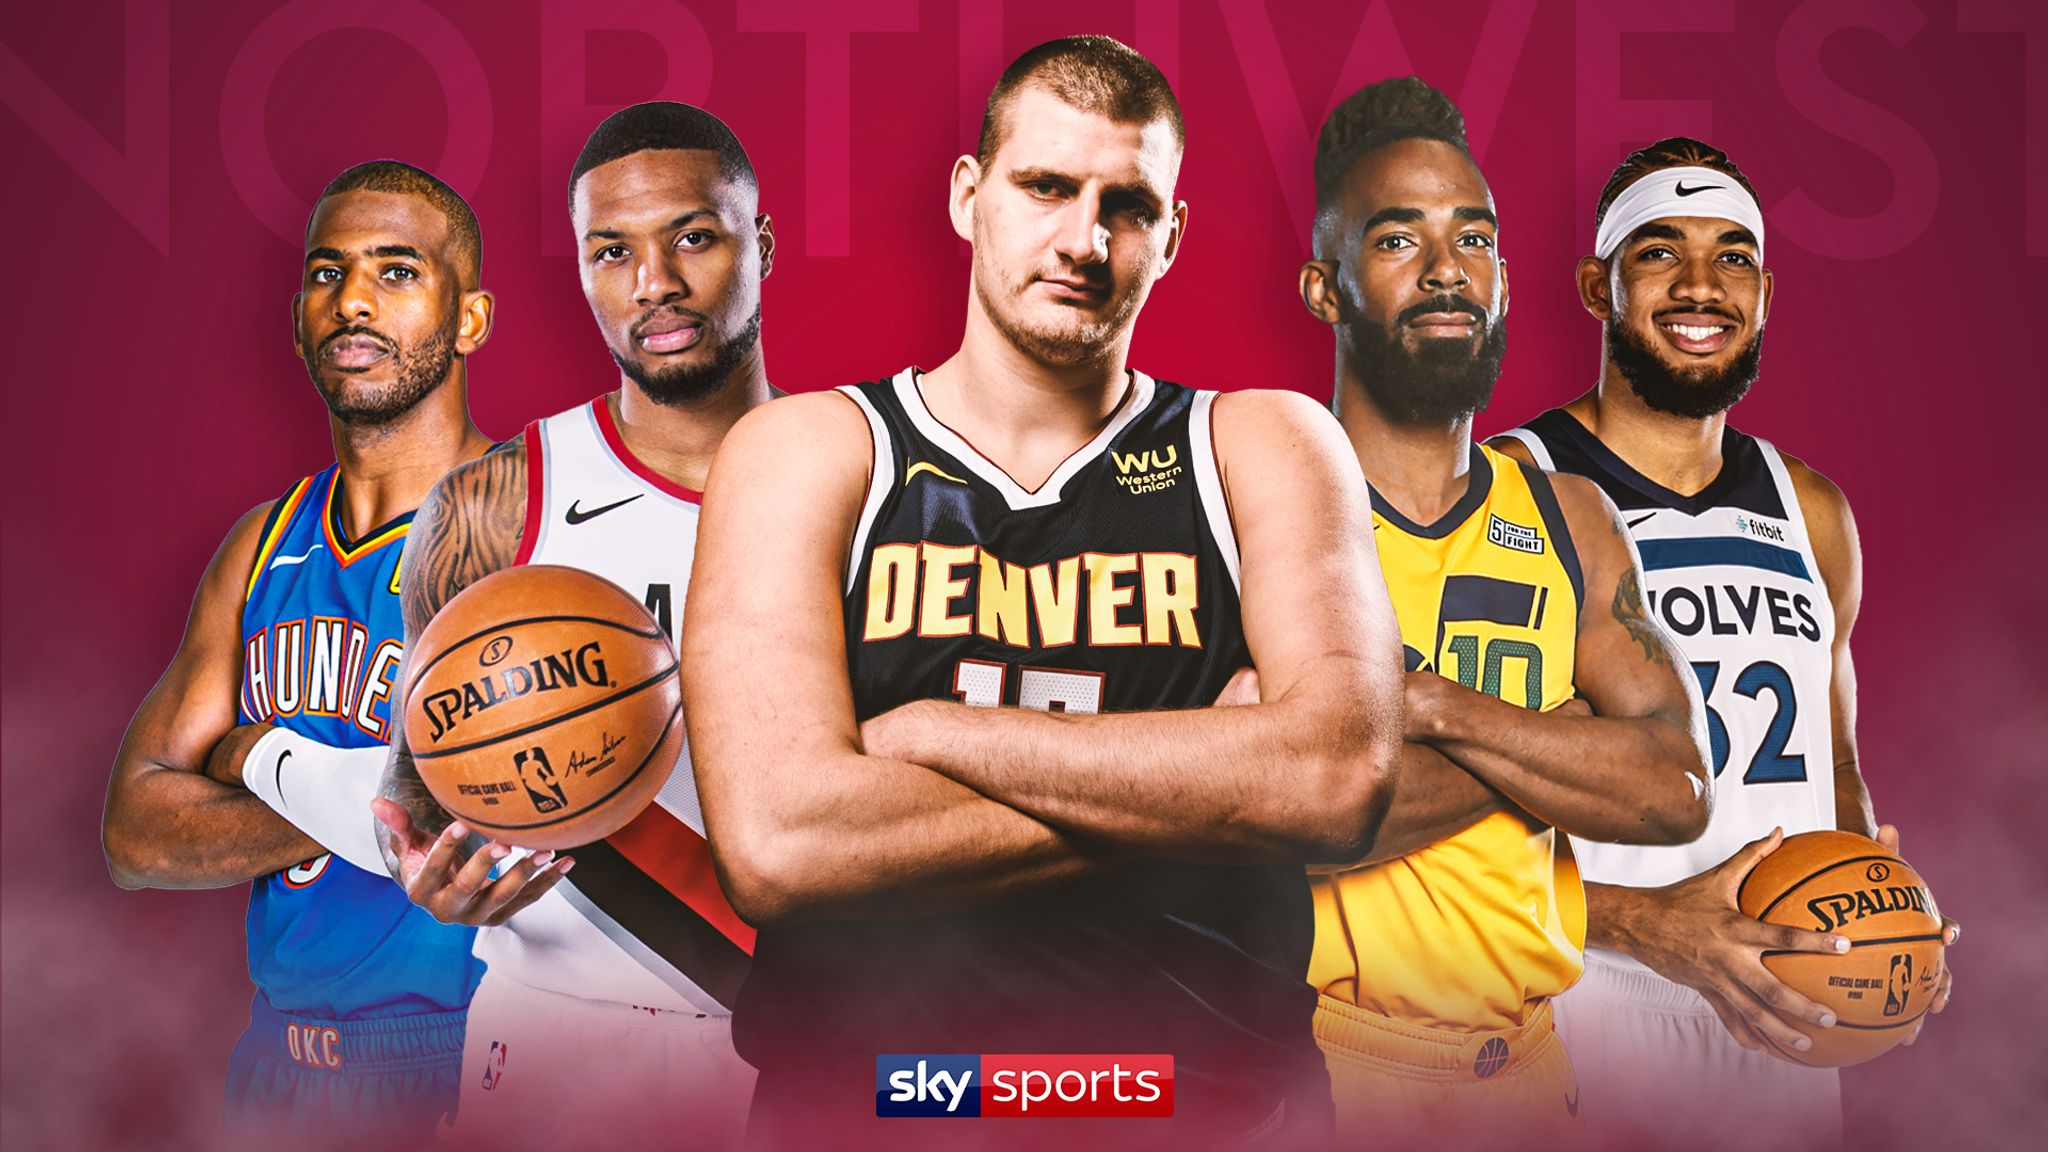 Mike Tuck's Northwest Division preview: Denver Nuggets, Portland Trail Blazers, Utah Jazz, Oklahoma City Thunder, Minnesota Timberwolves